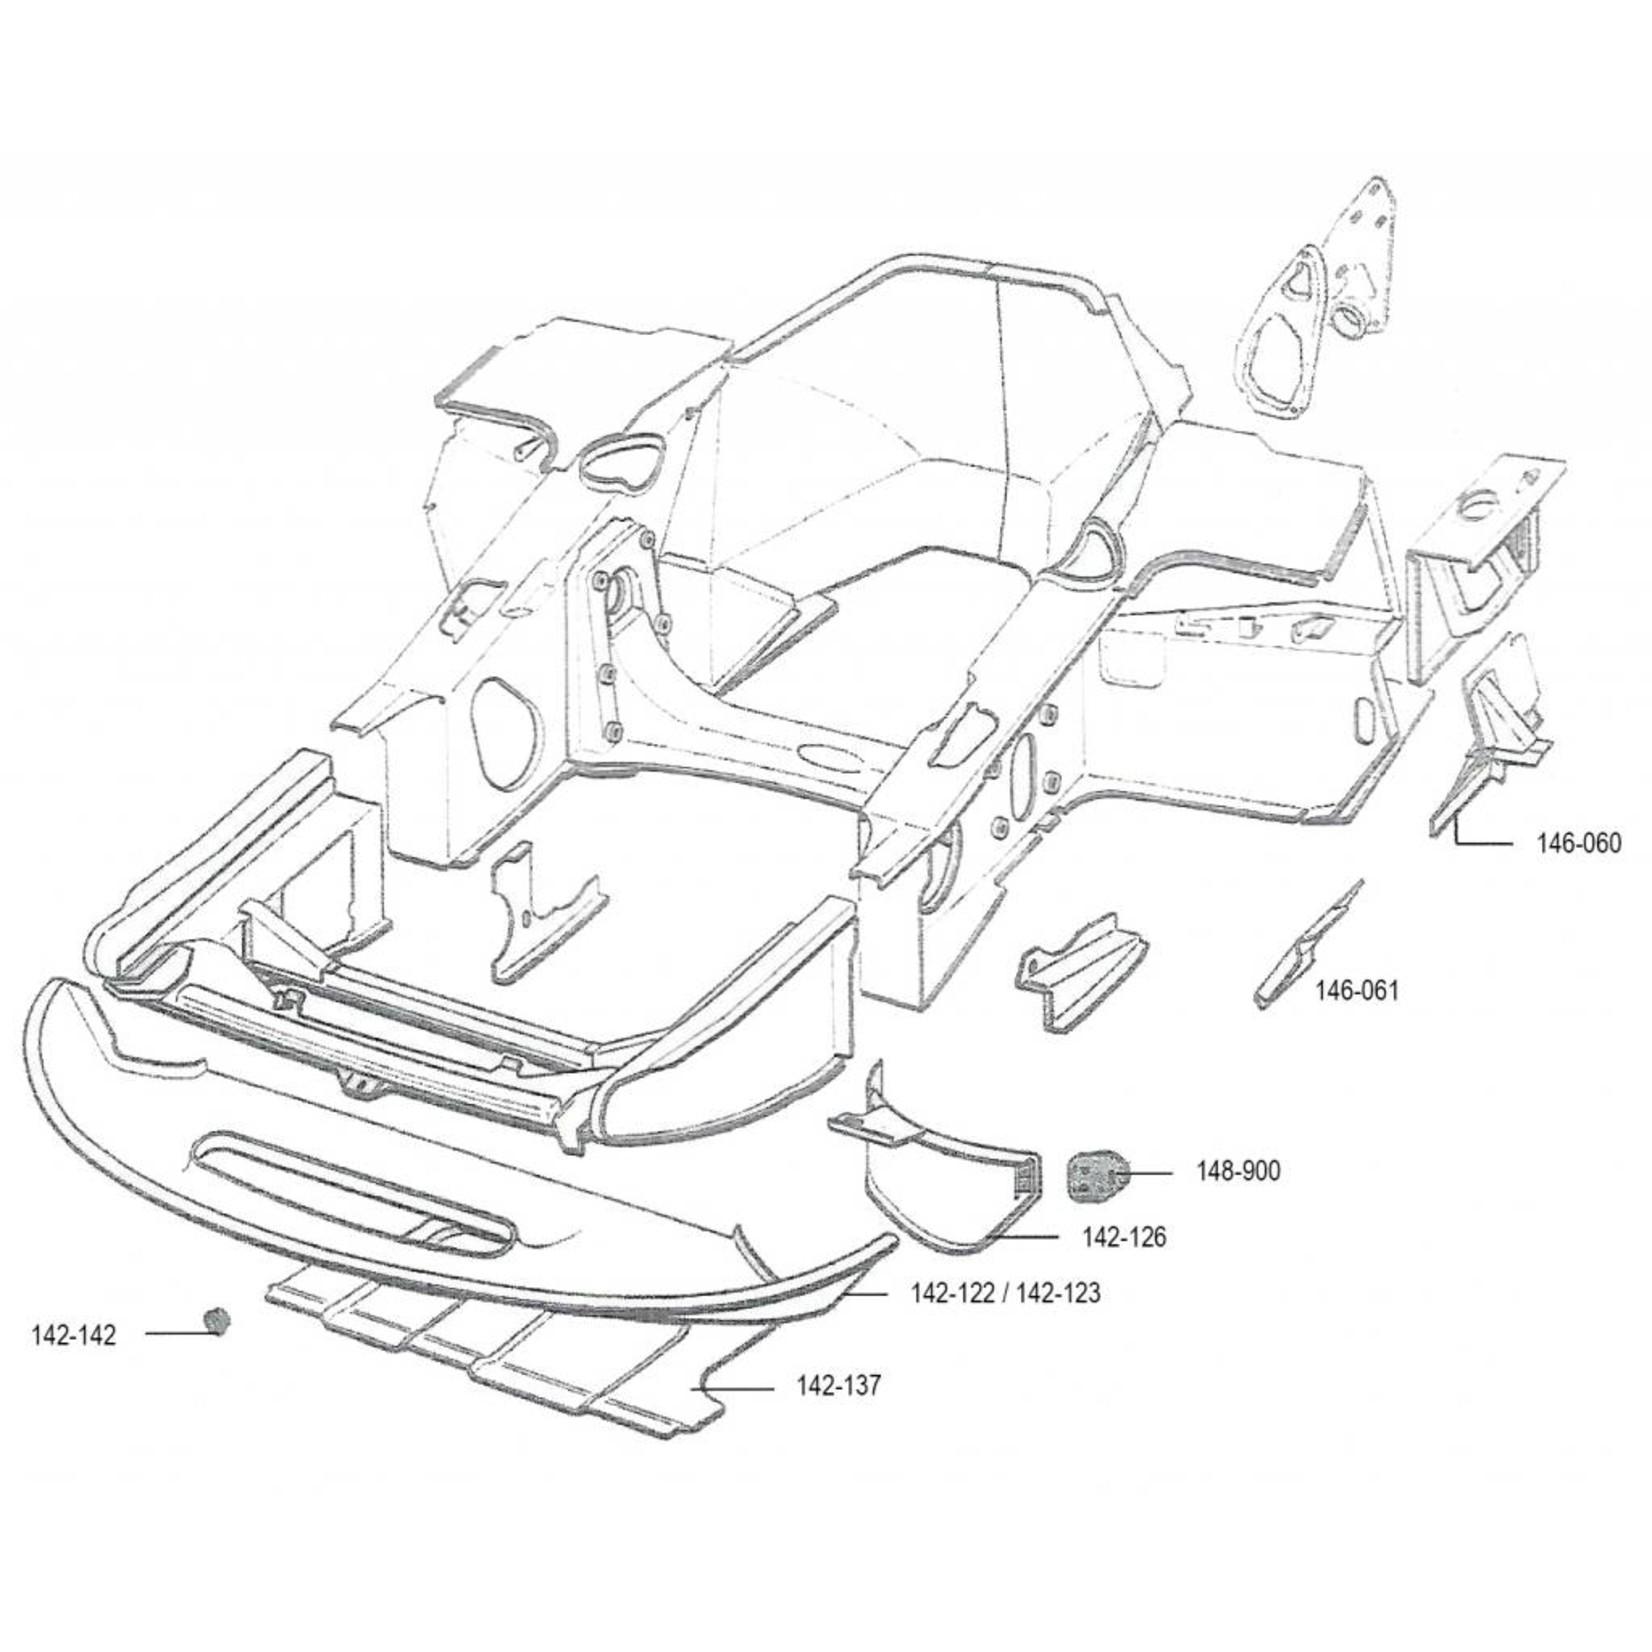 Chapa de revistimento polyester 62-68 Nr Org: DX85399A